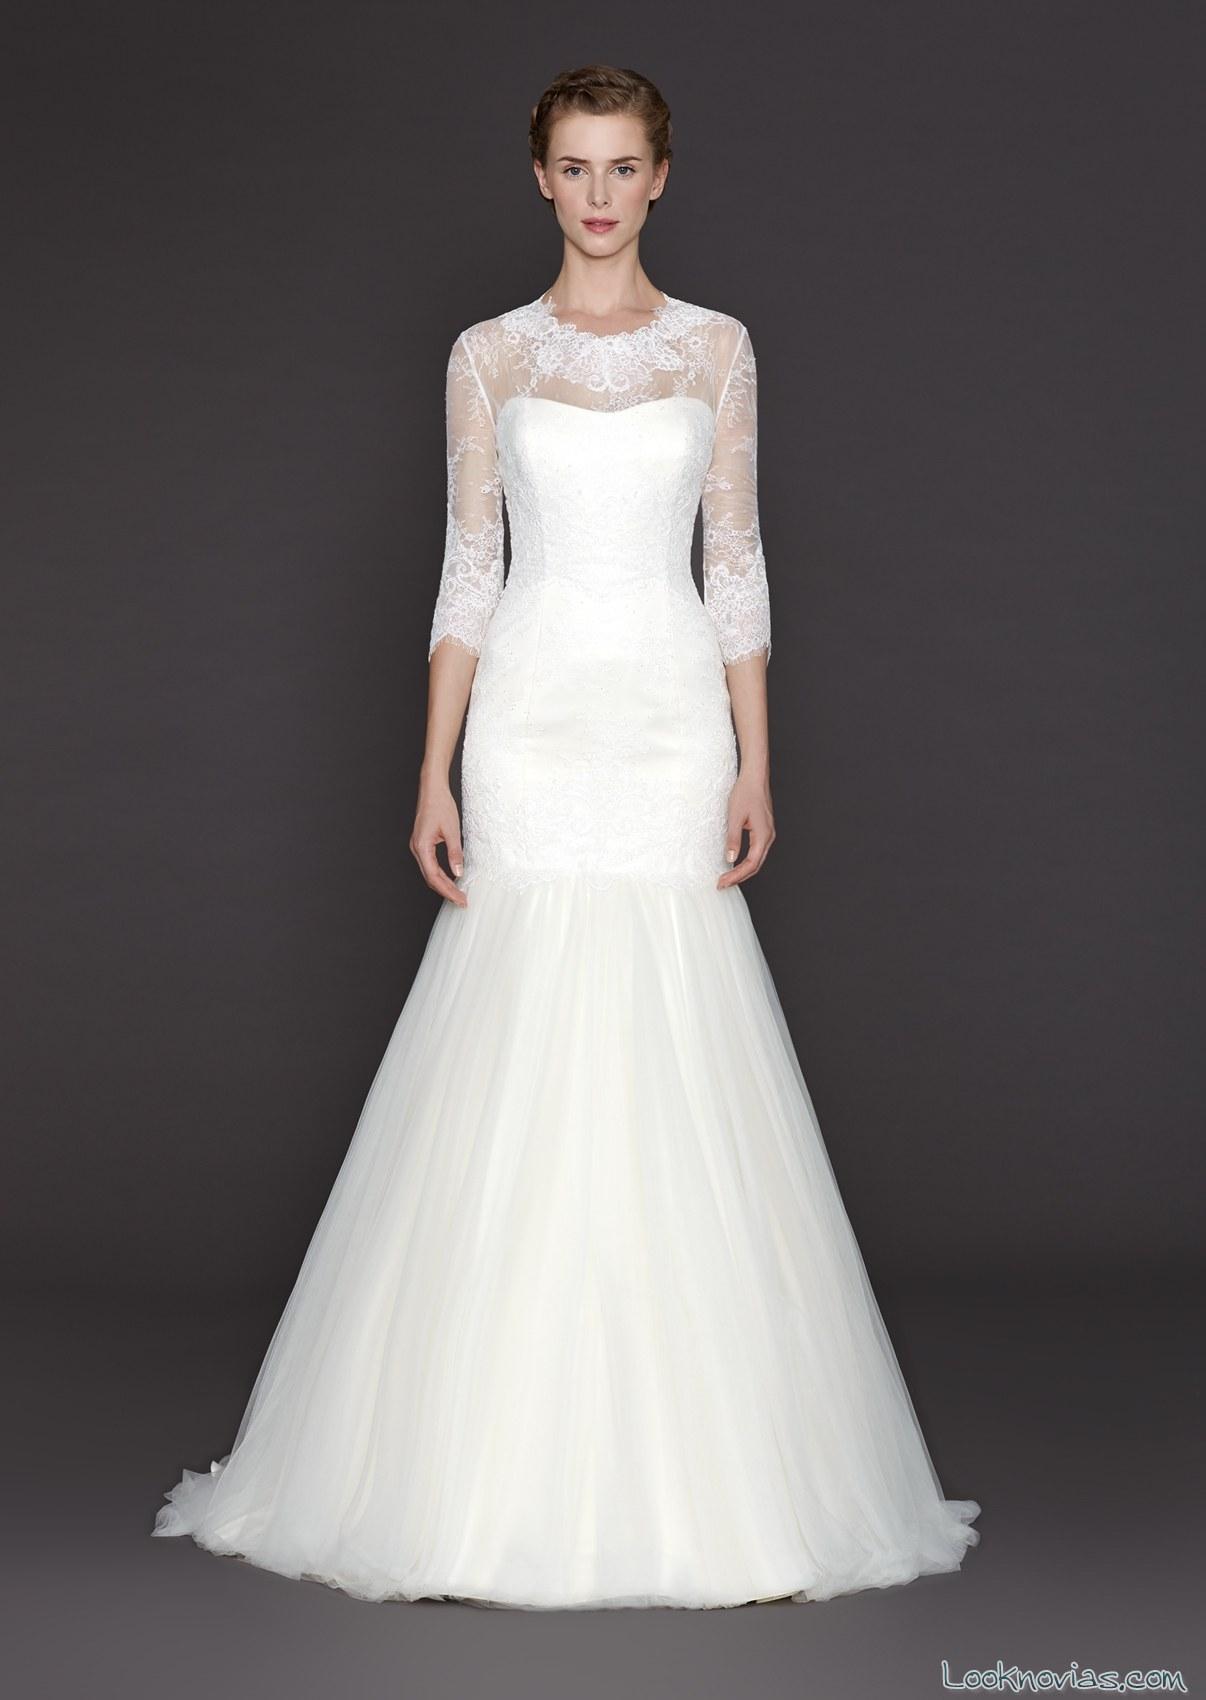 vestido de novia corte sirena con mangas